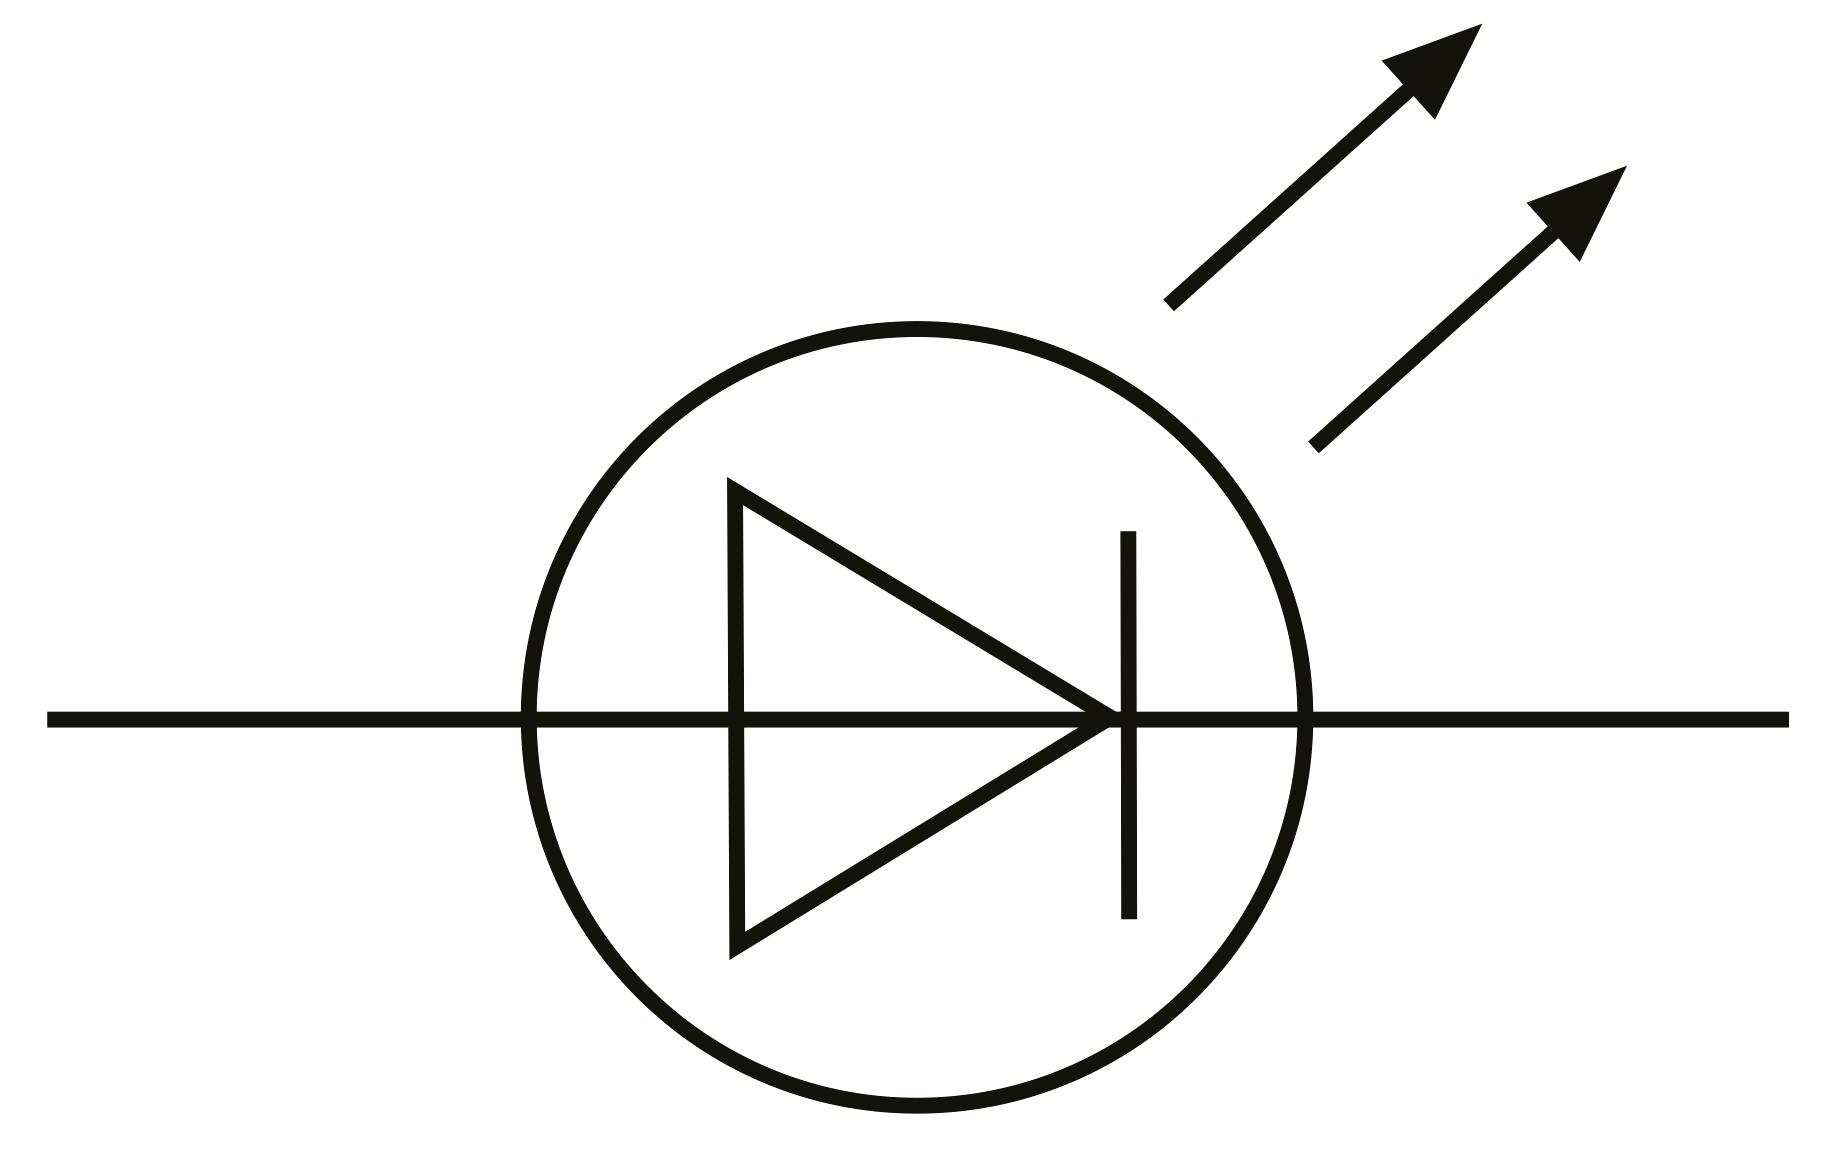 circuit symbol for light emitting diode